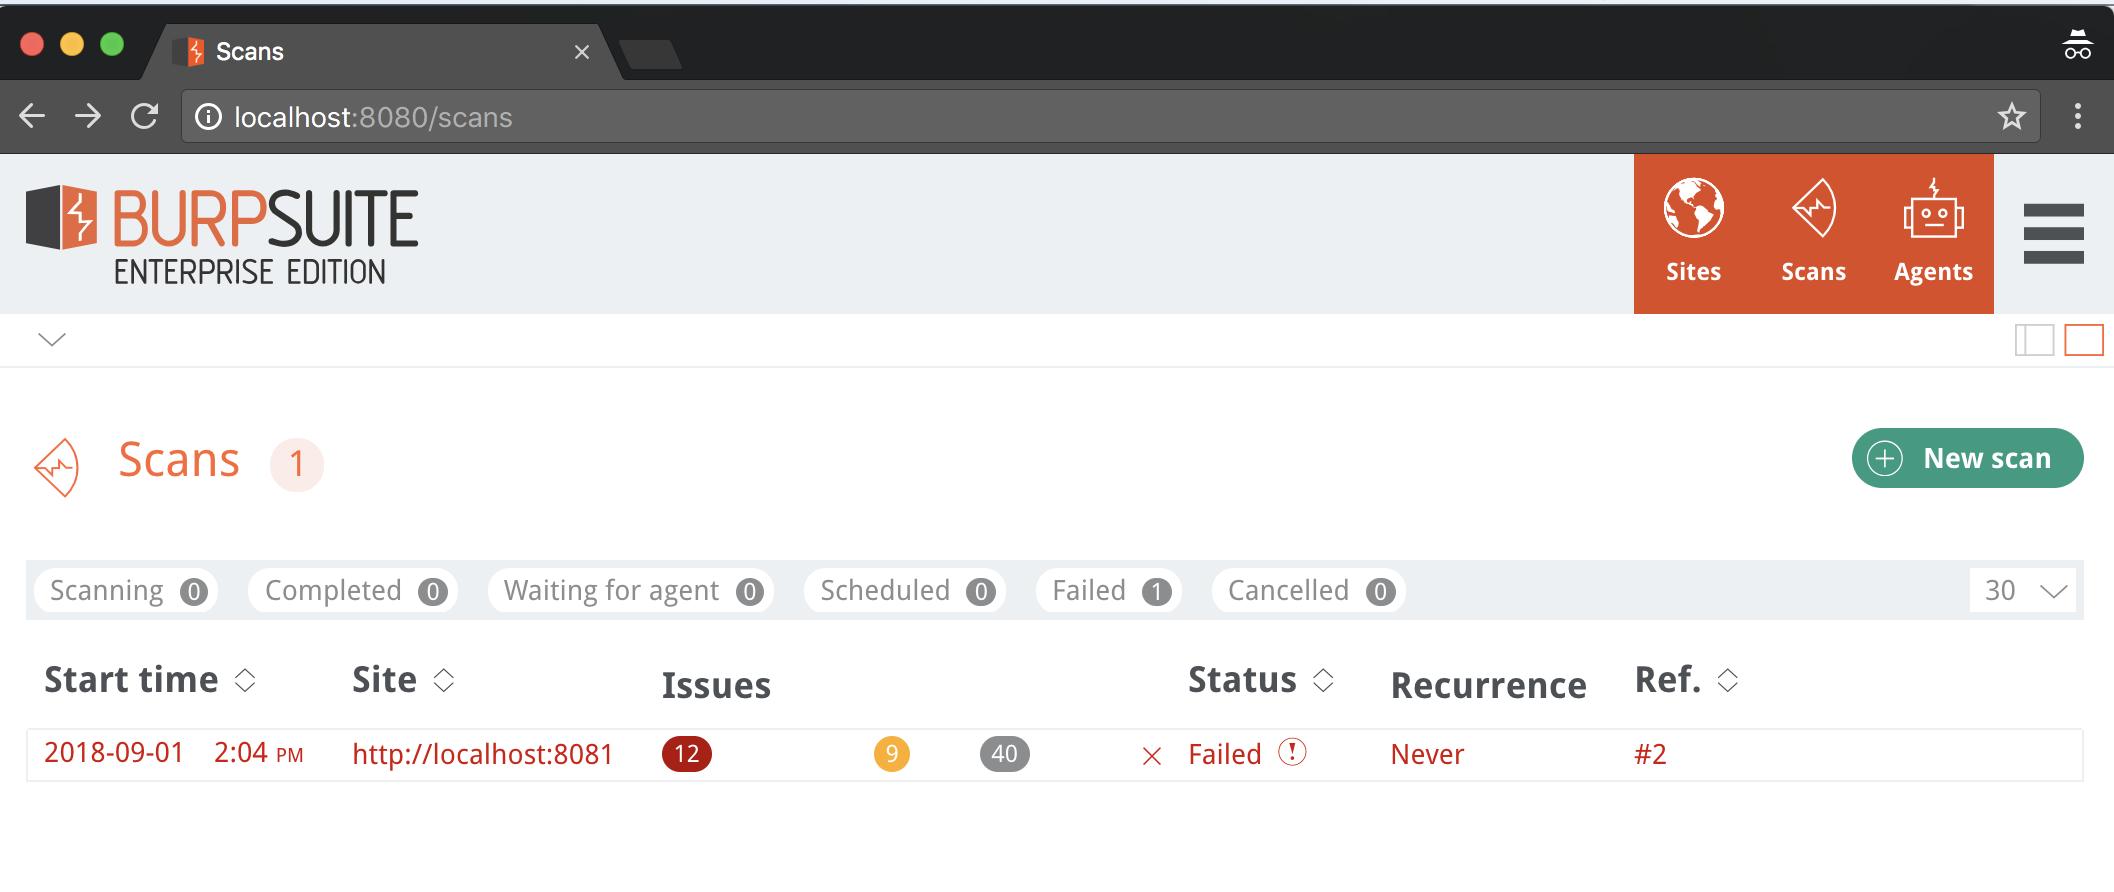 Burp's new Enterprise version and REST API